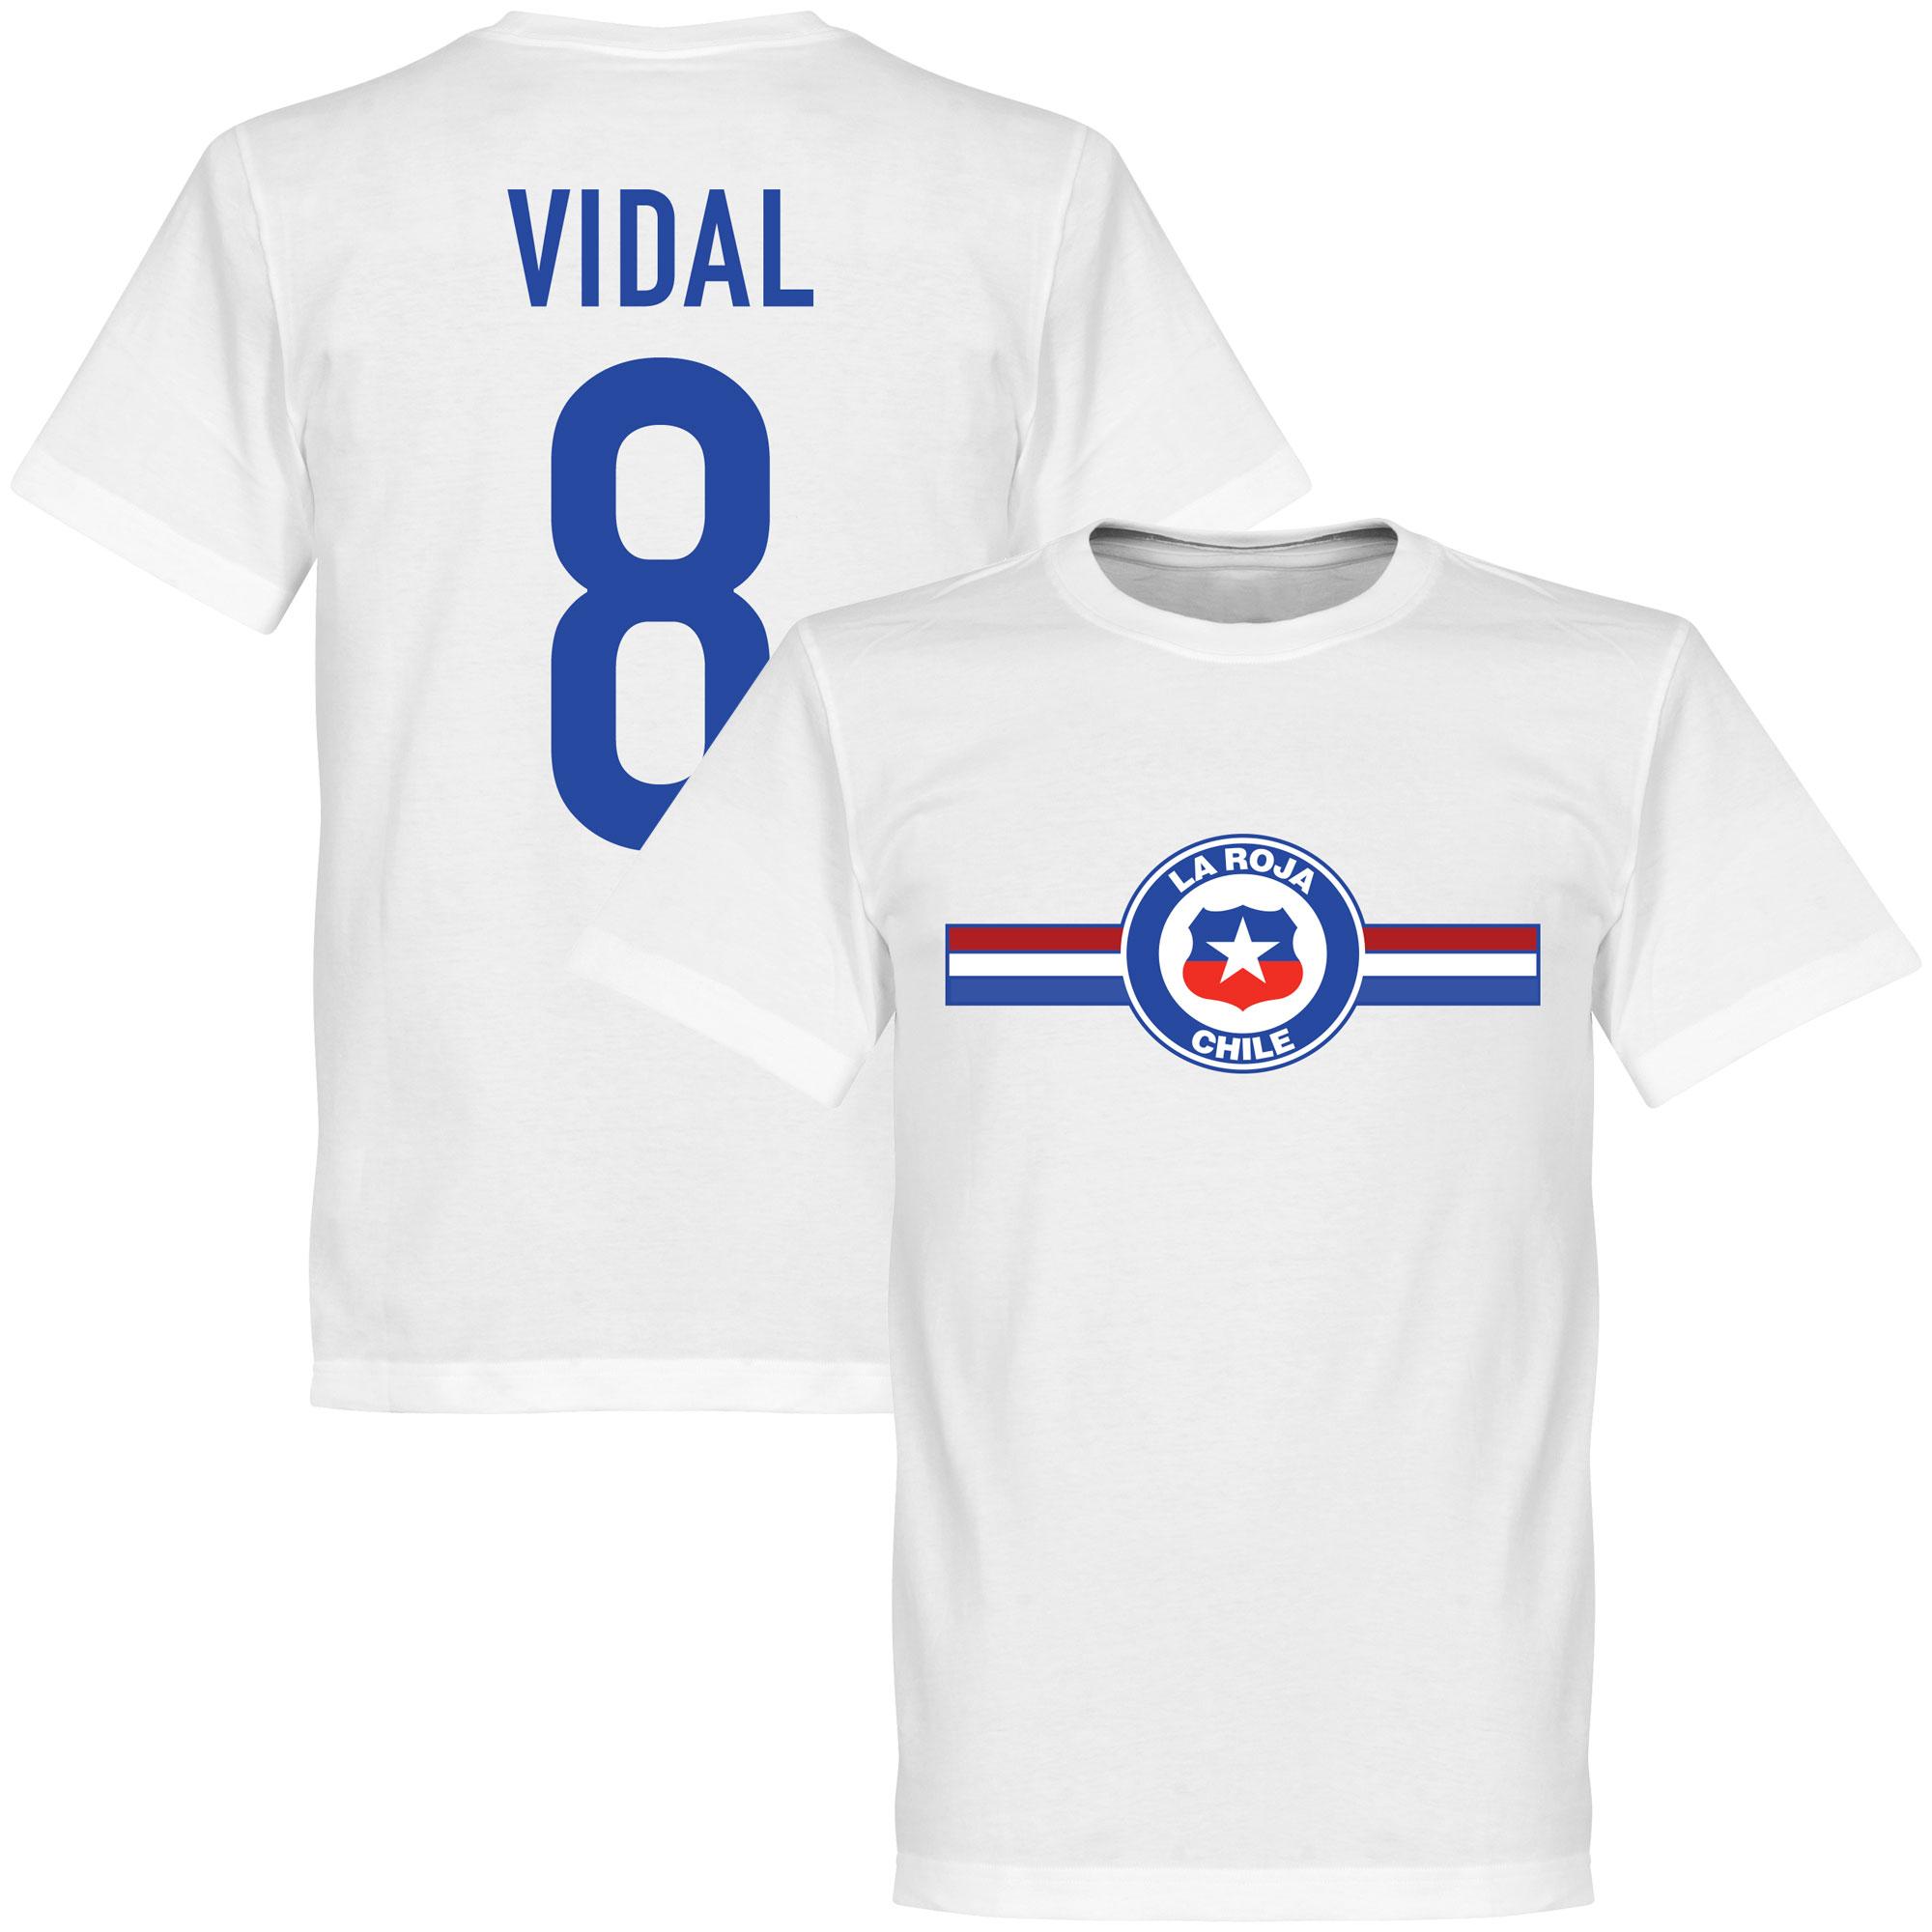 Chile Vidal Tee - White - M